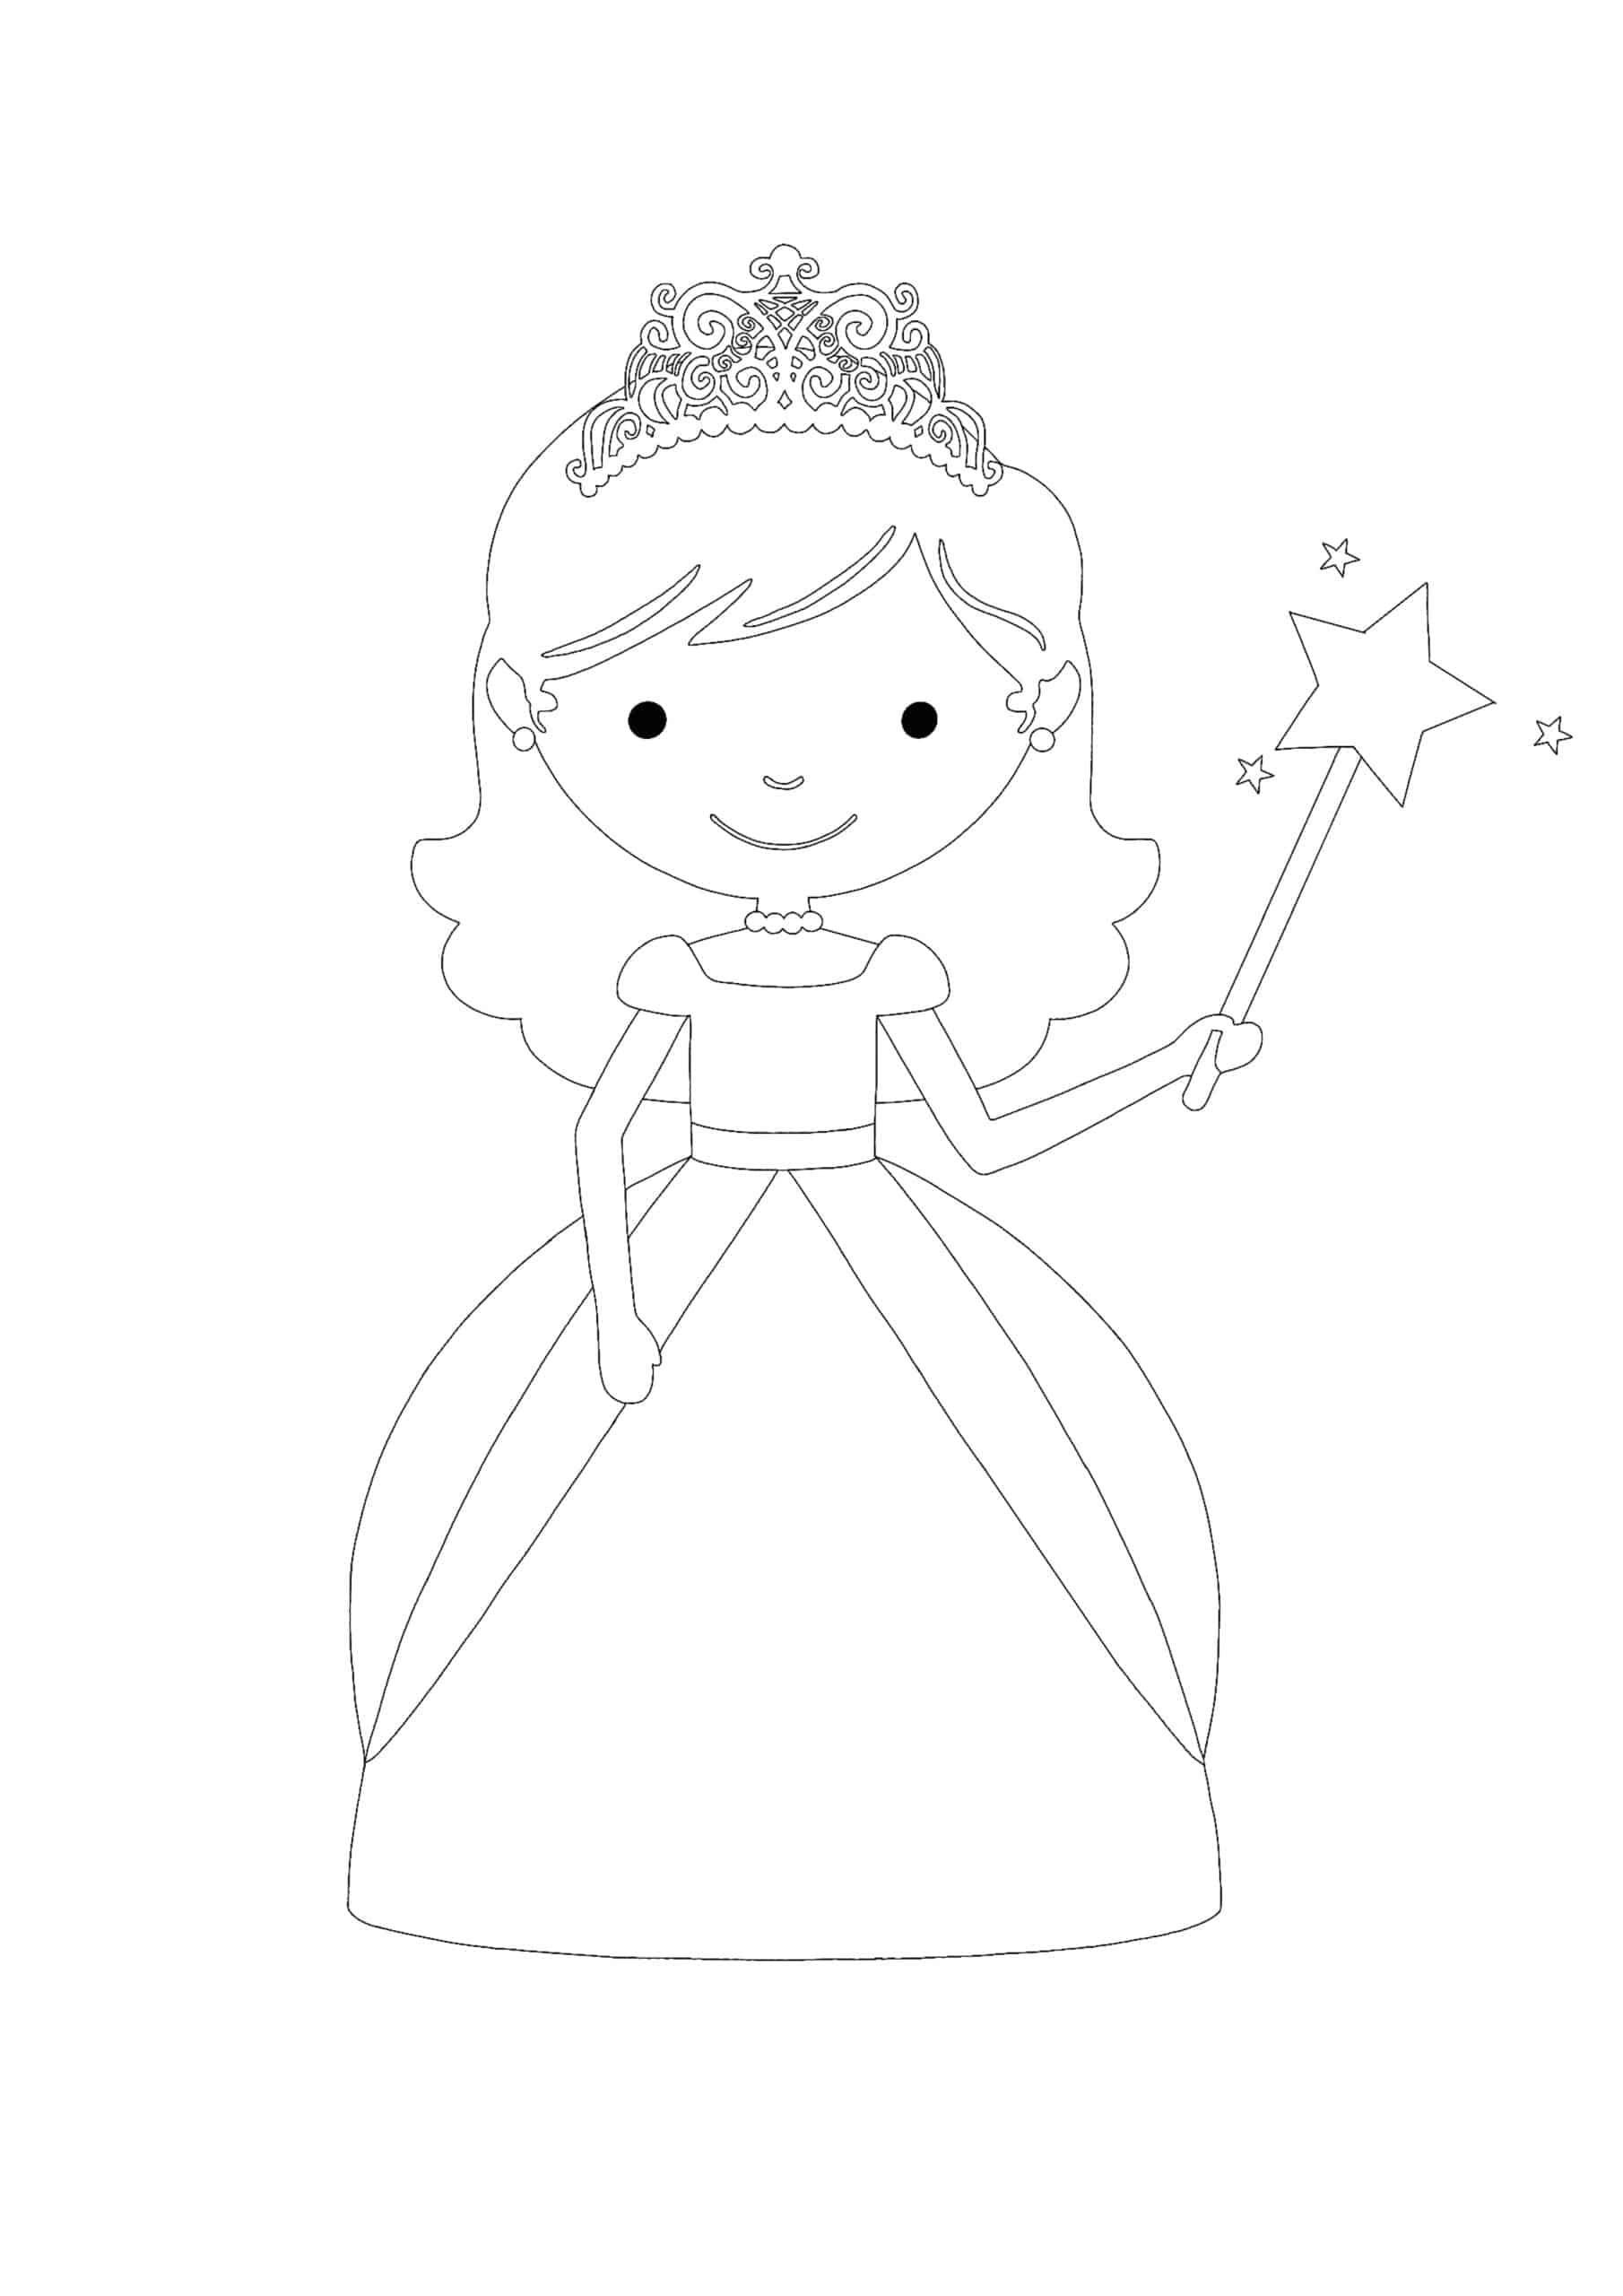 Baby Princess coloring page